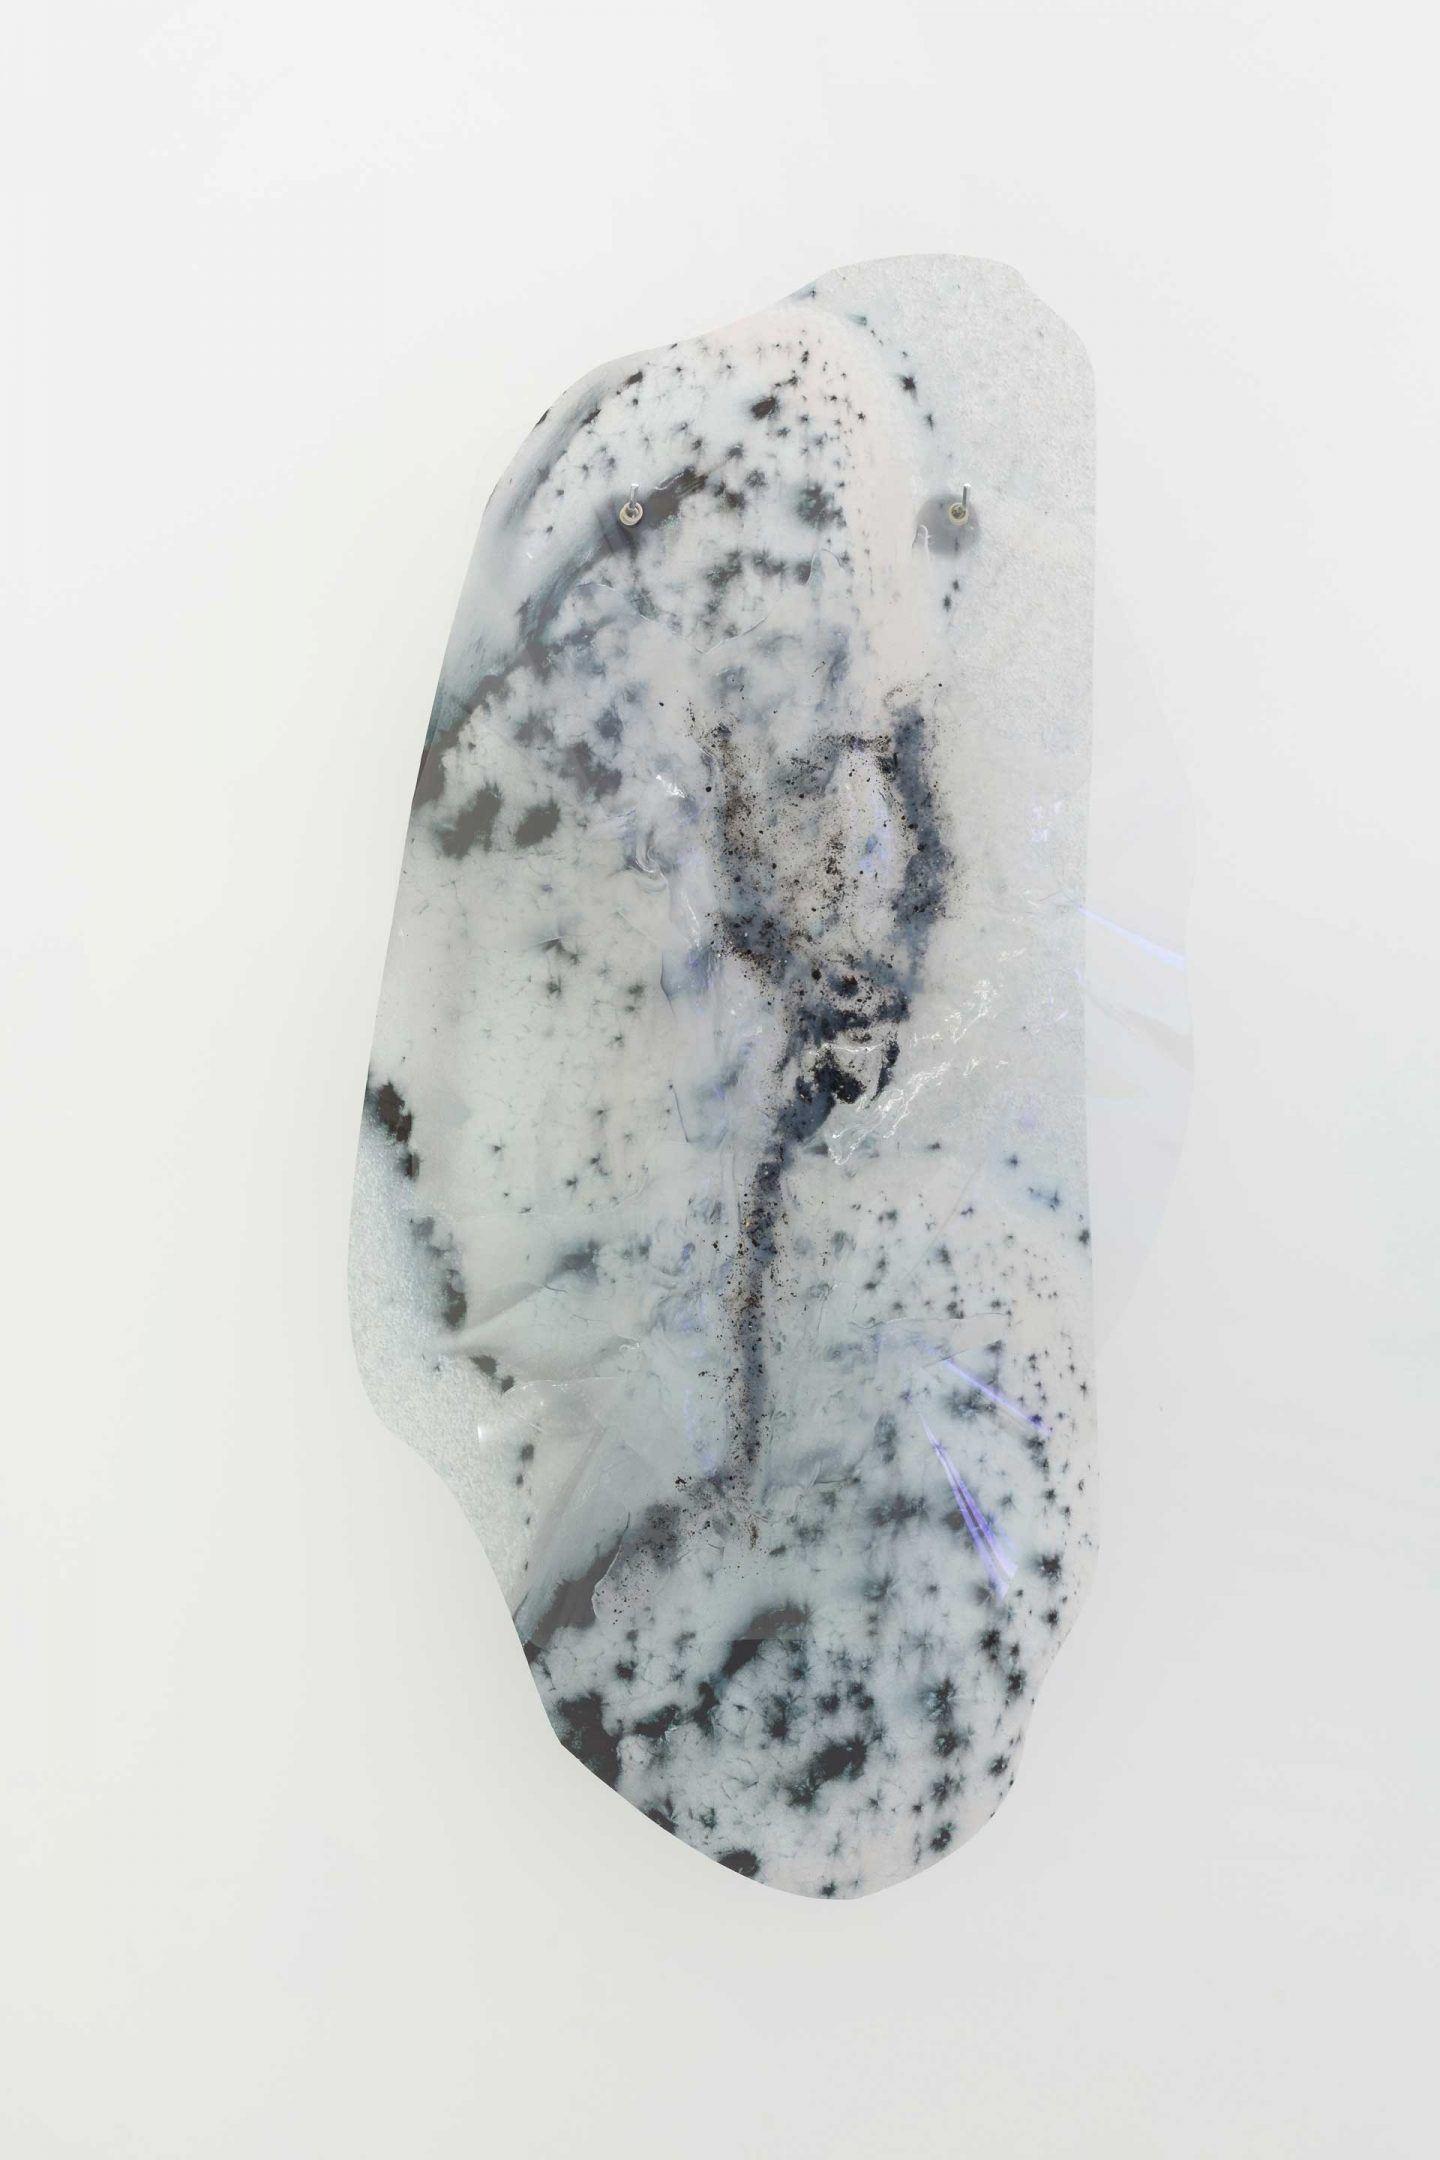 IGNANT-Art-Galeria-Duarte-Sequeira-Immortality-Future-013